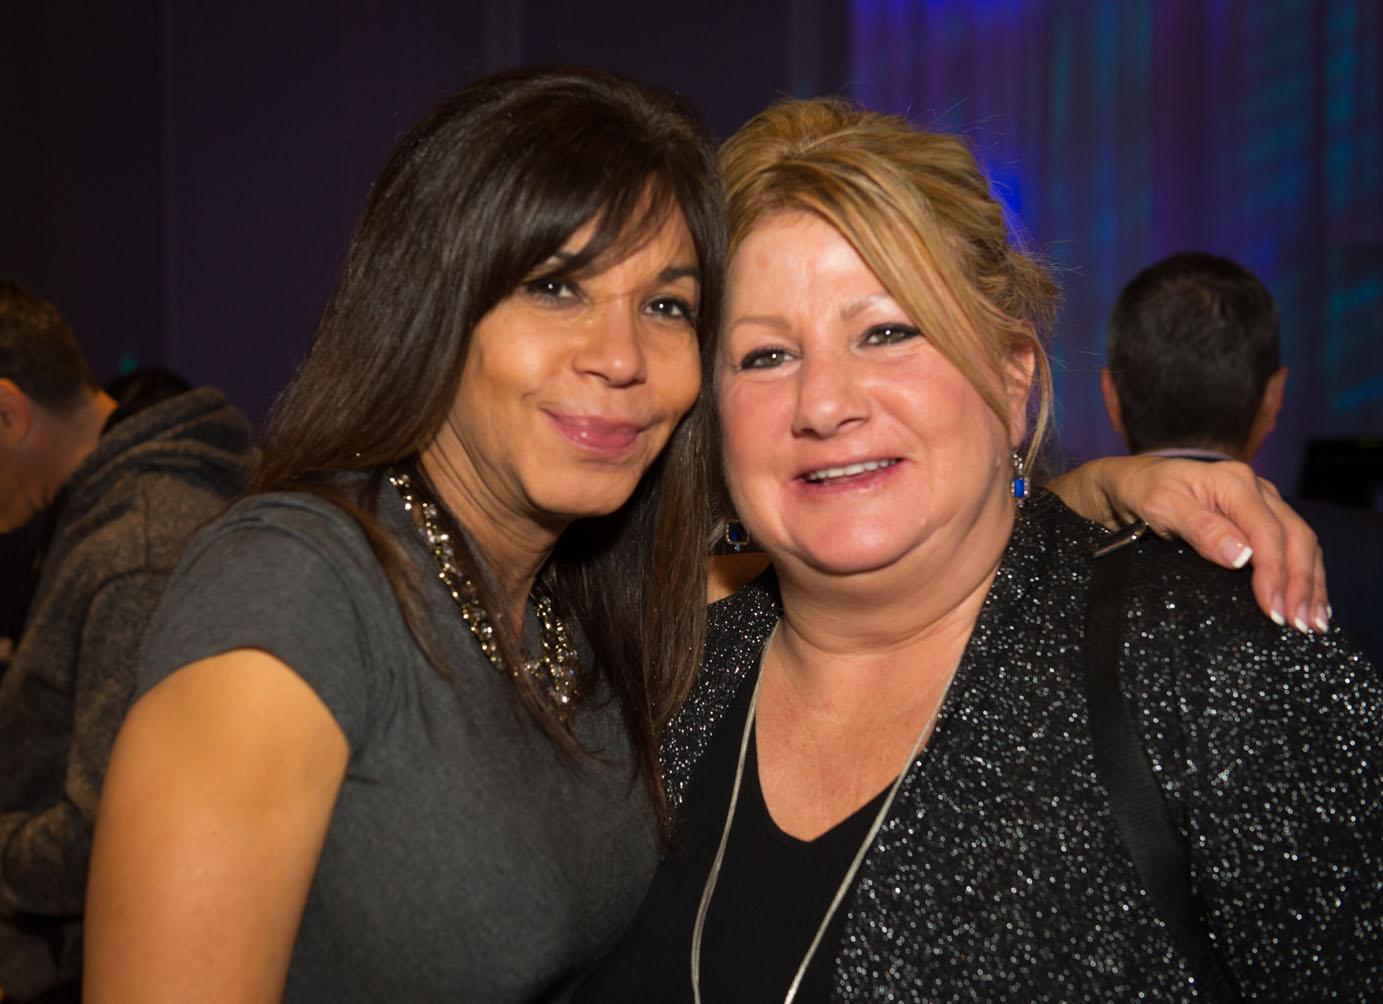 2015-12-09 ReMax Corpoarte Event - The Borgata - Atlantic City NJ - Photo Sesh - 2015-5239.jpg